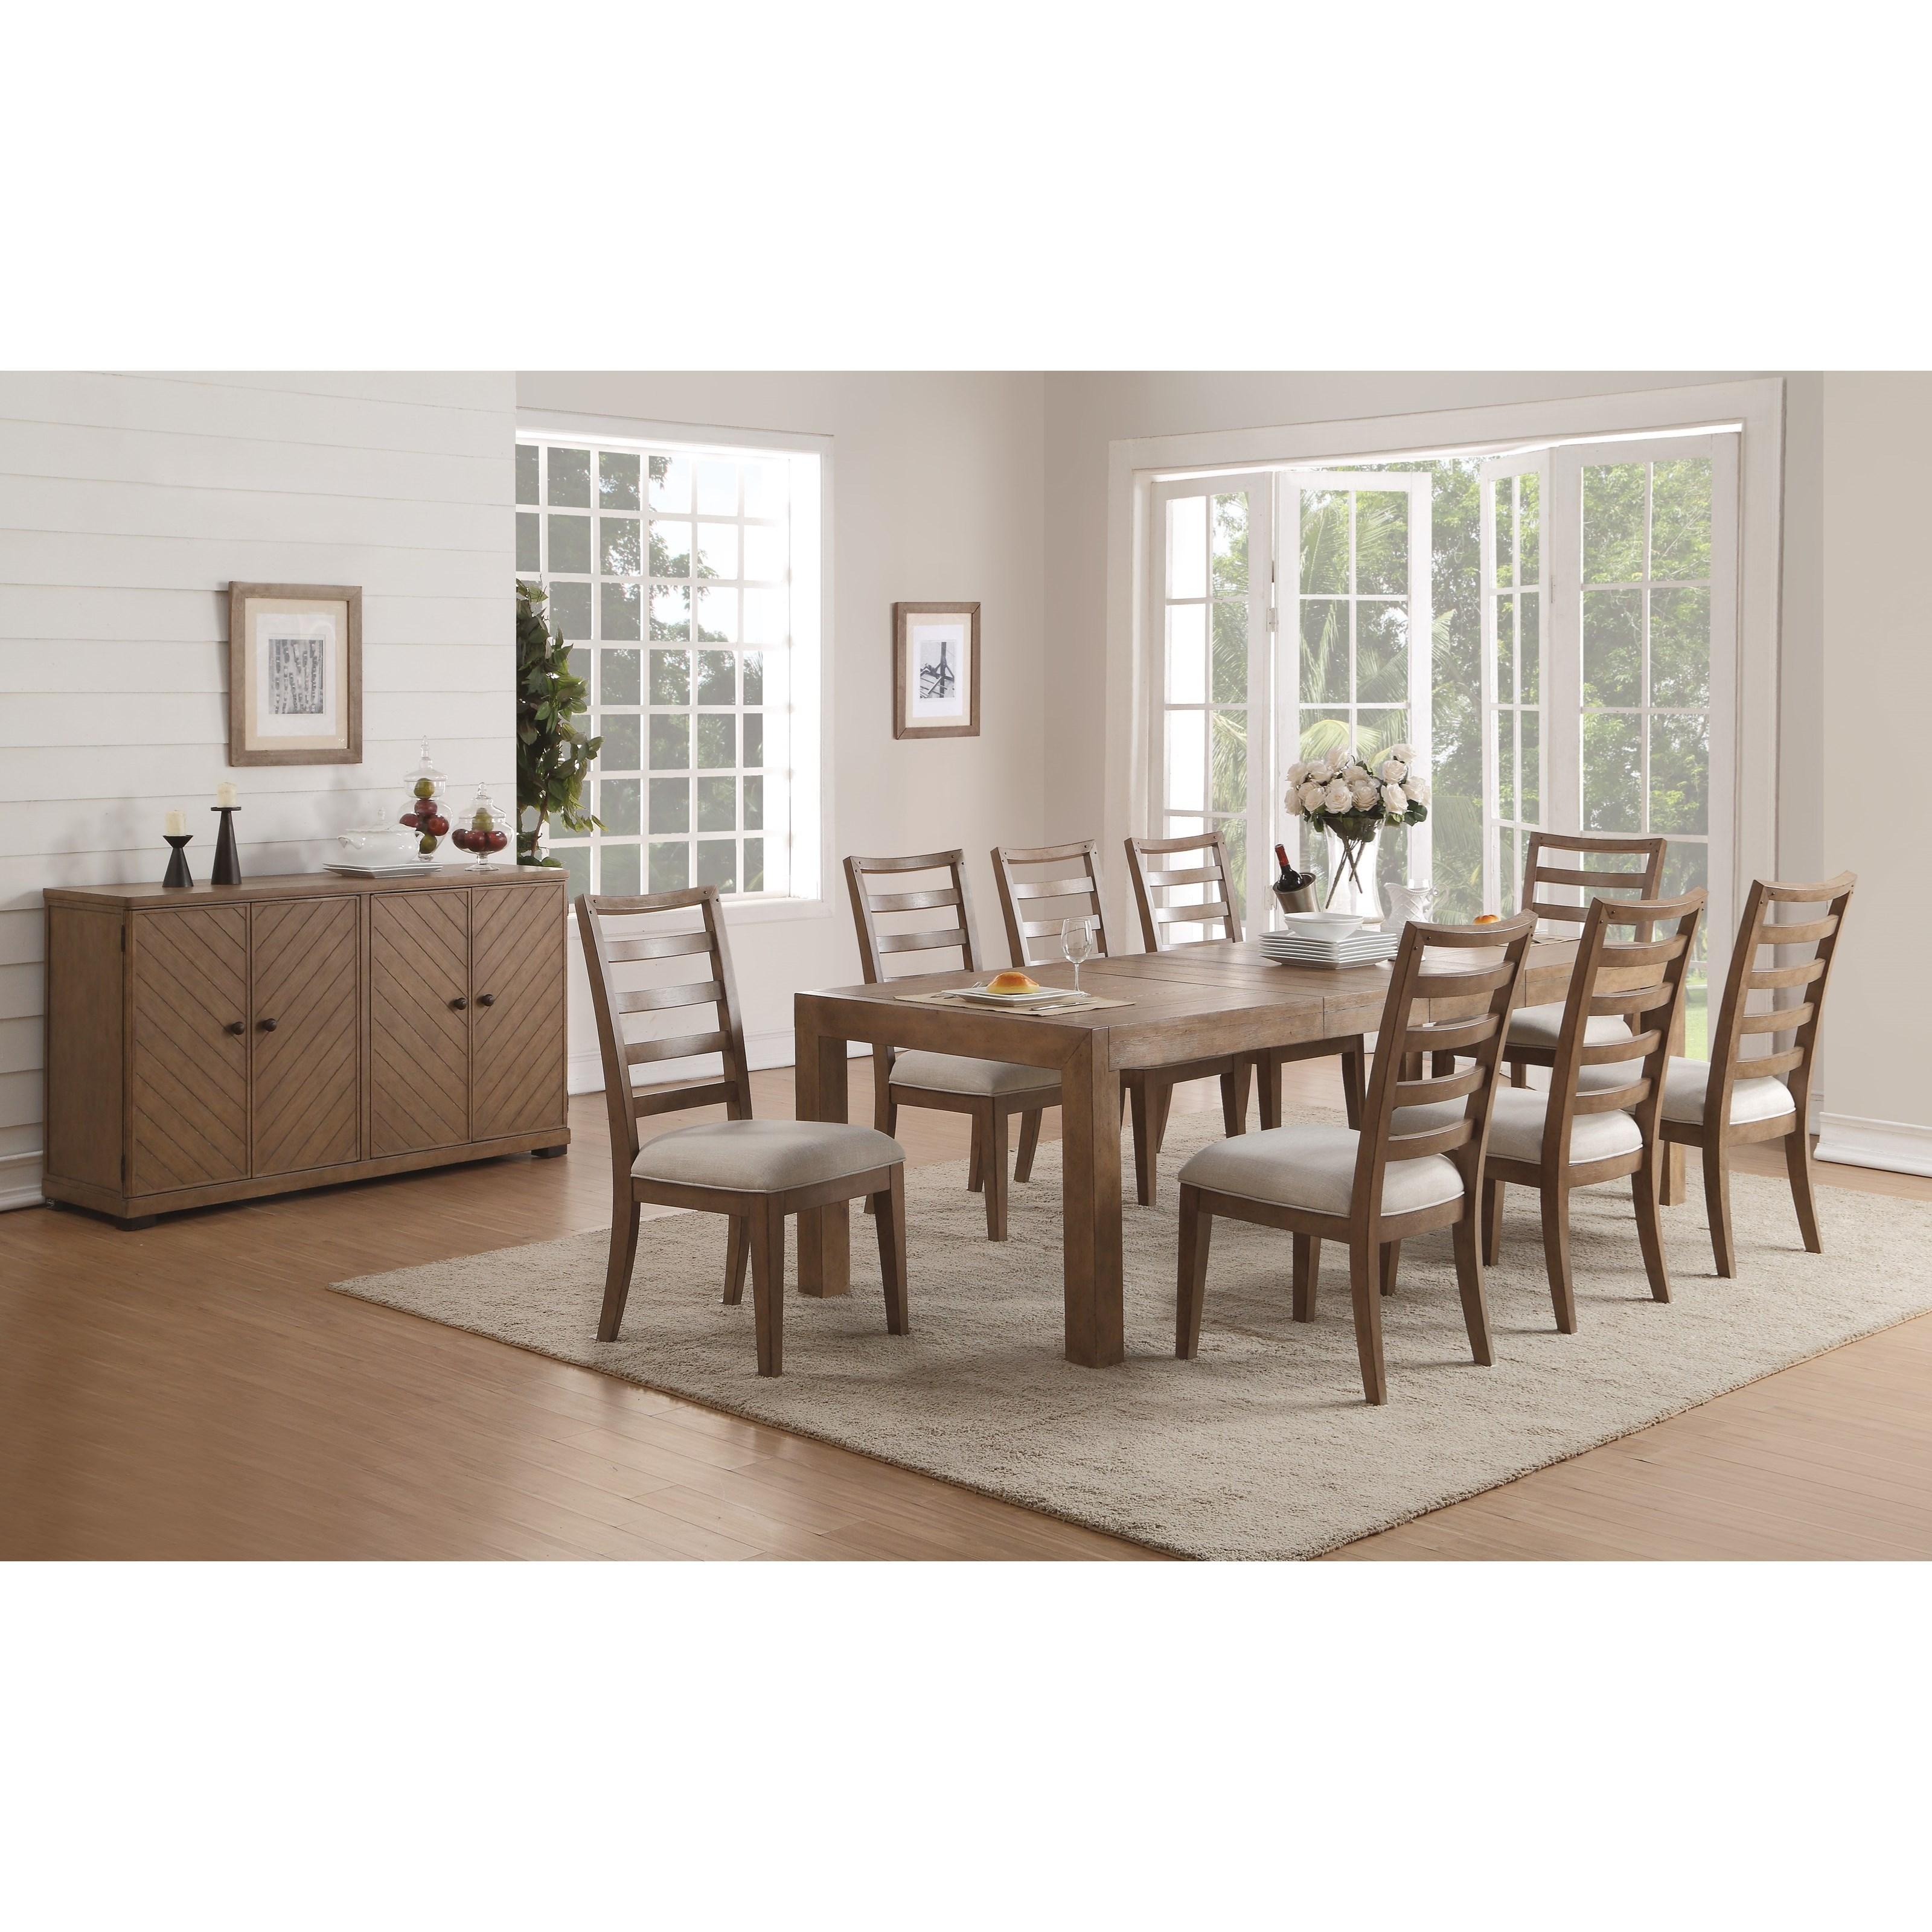 Flexsteel Wynwood Collection Carmen Formal Dining Room Group - Item Number: W1146 Dining Room Group 4